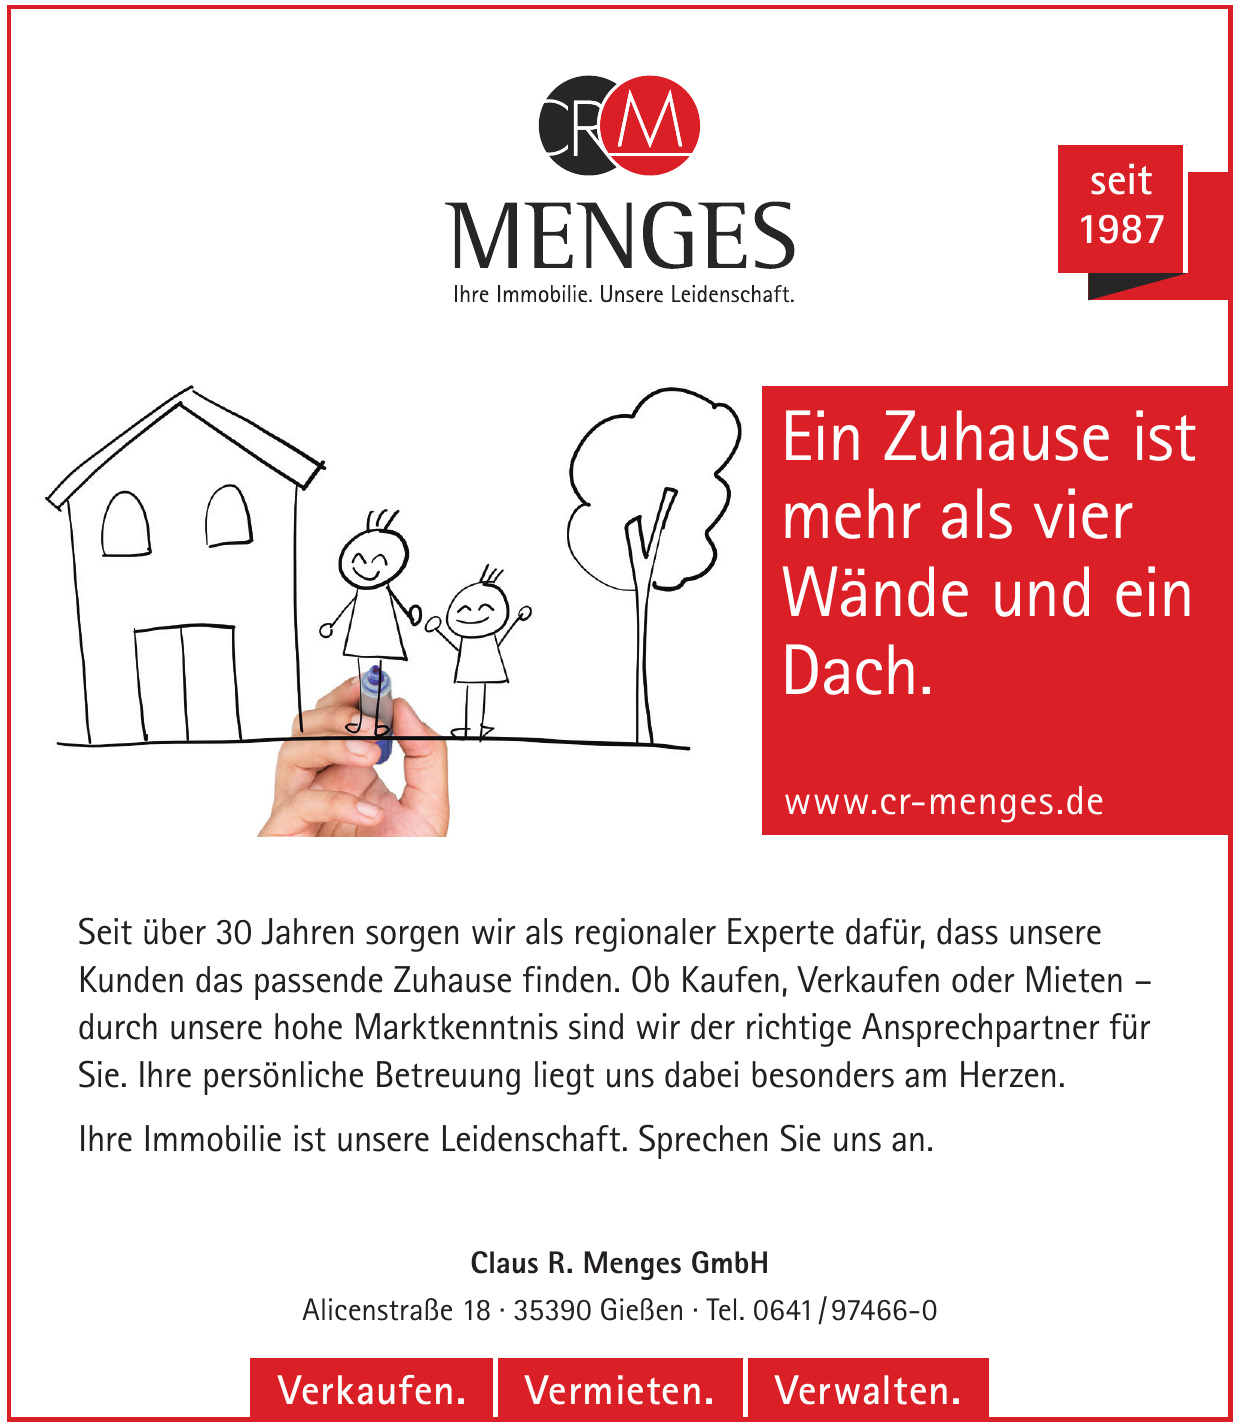 Claus R. Menges GmbH